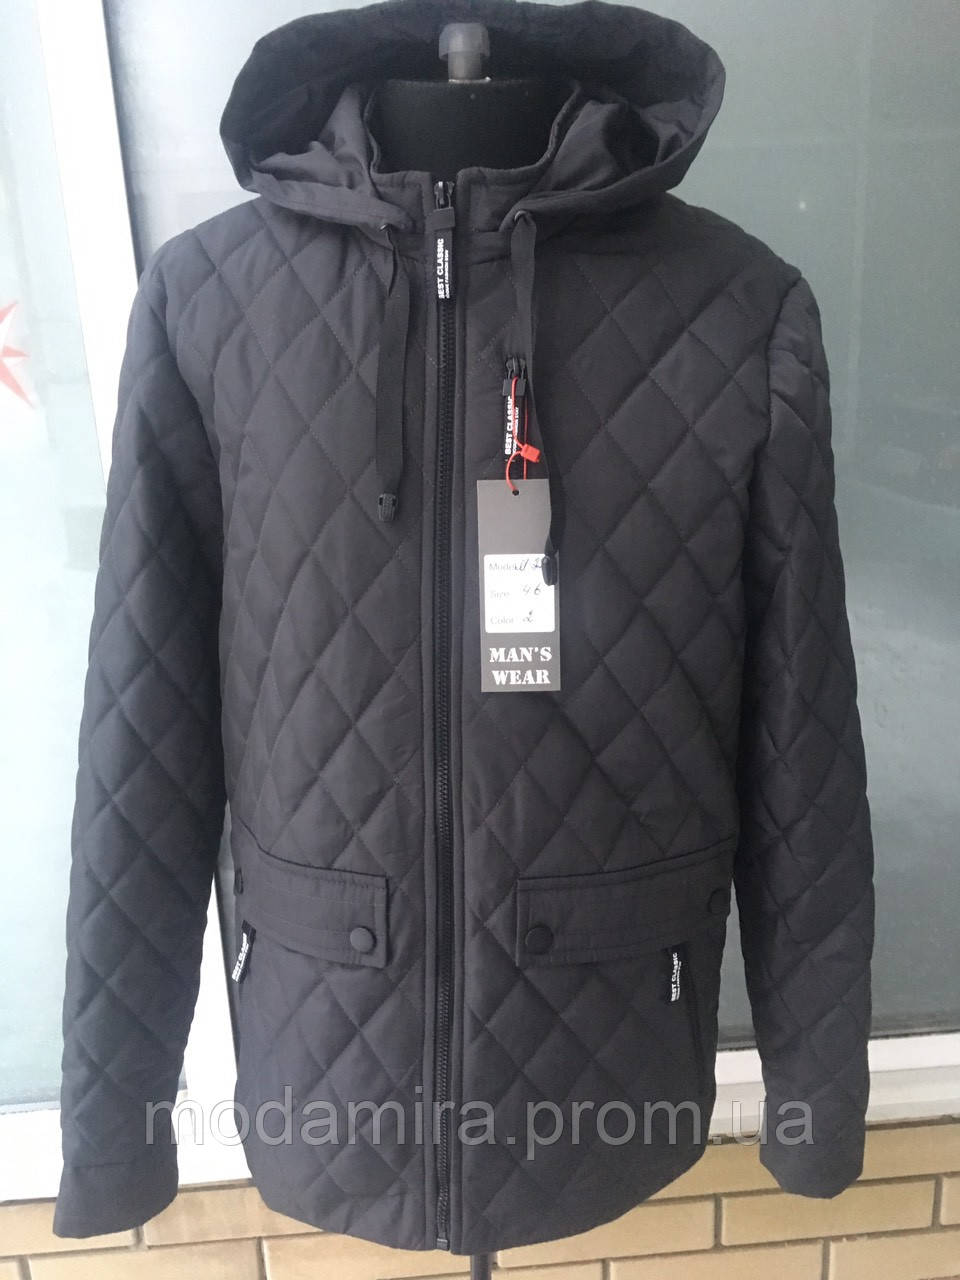 Мужская весенняя стеганая куртка р-46 3f21791731a78